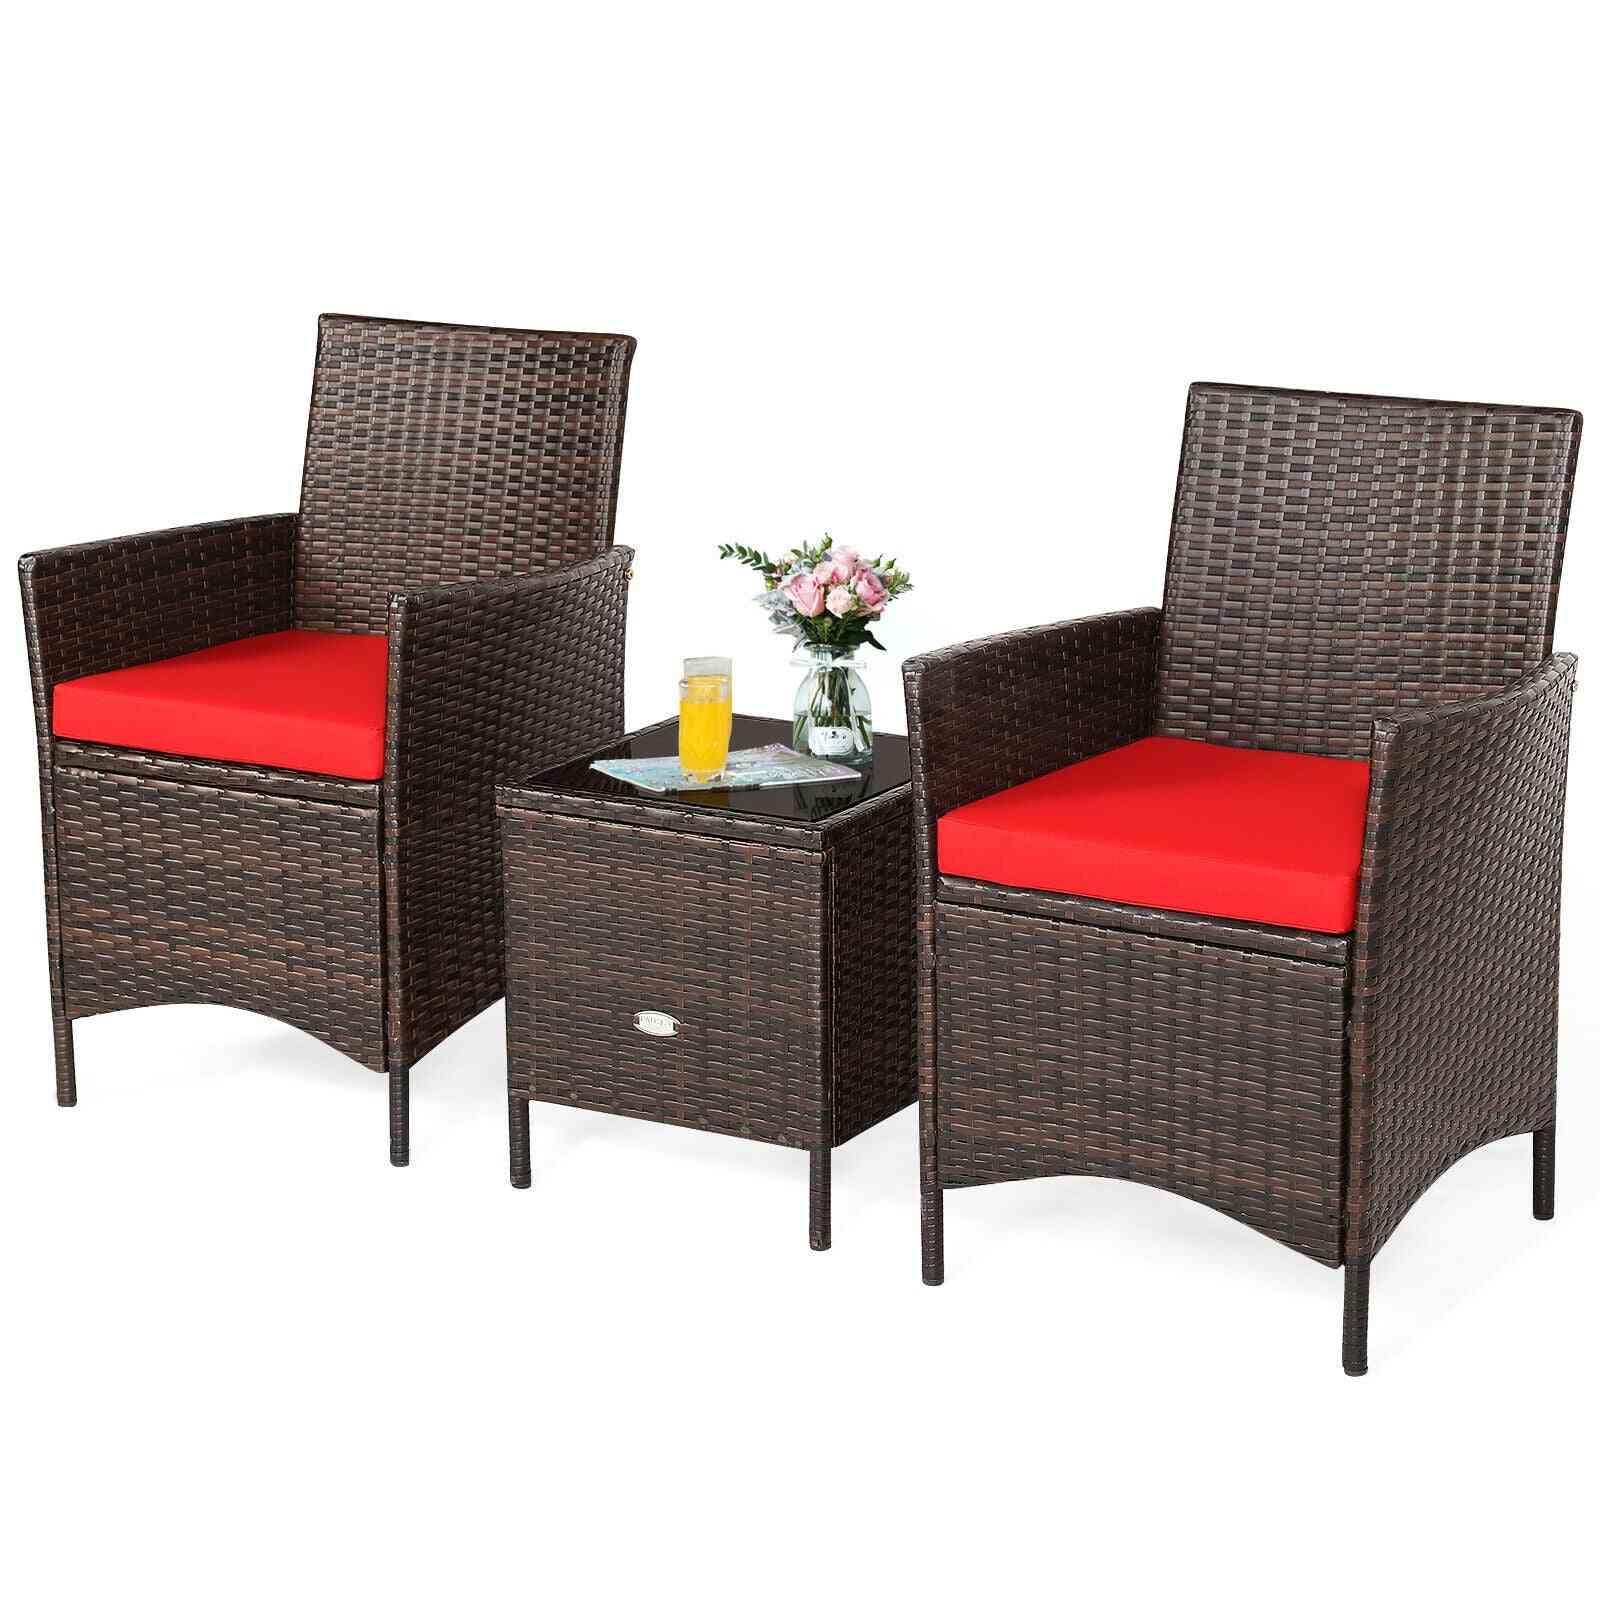 Rattan Furniture Set Cushioned Sofa Glass Tabletop Deck